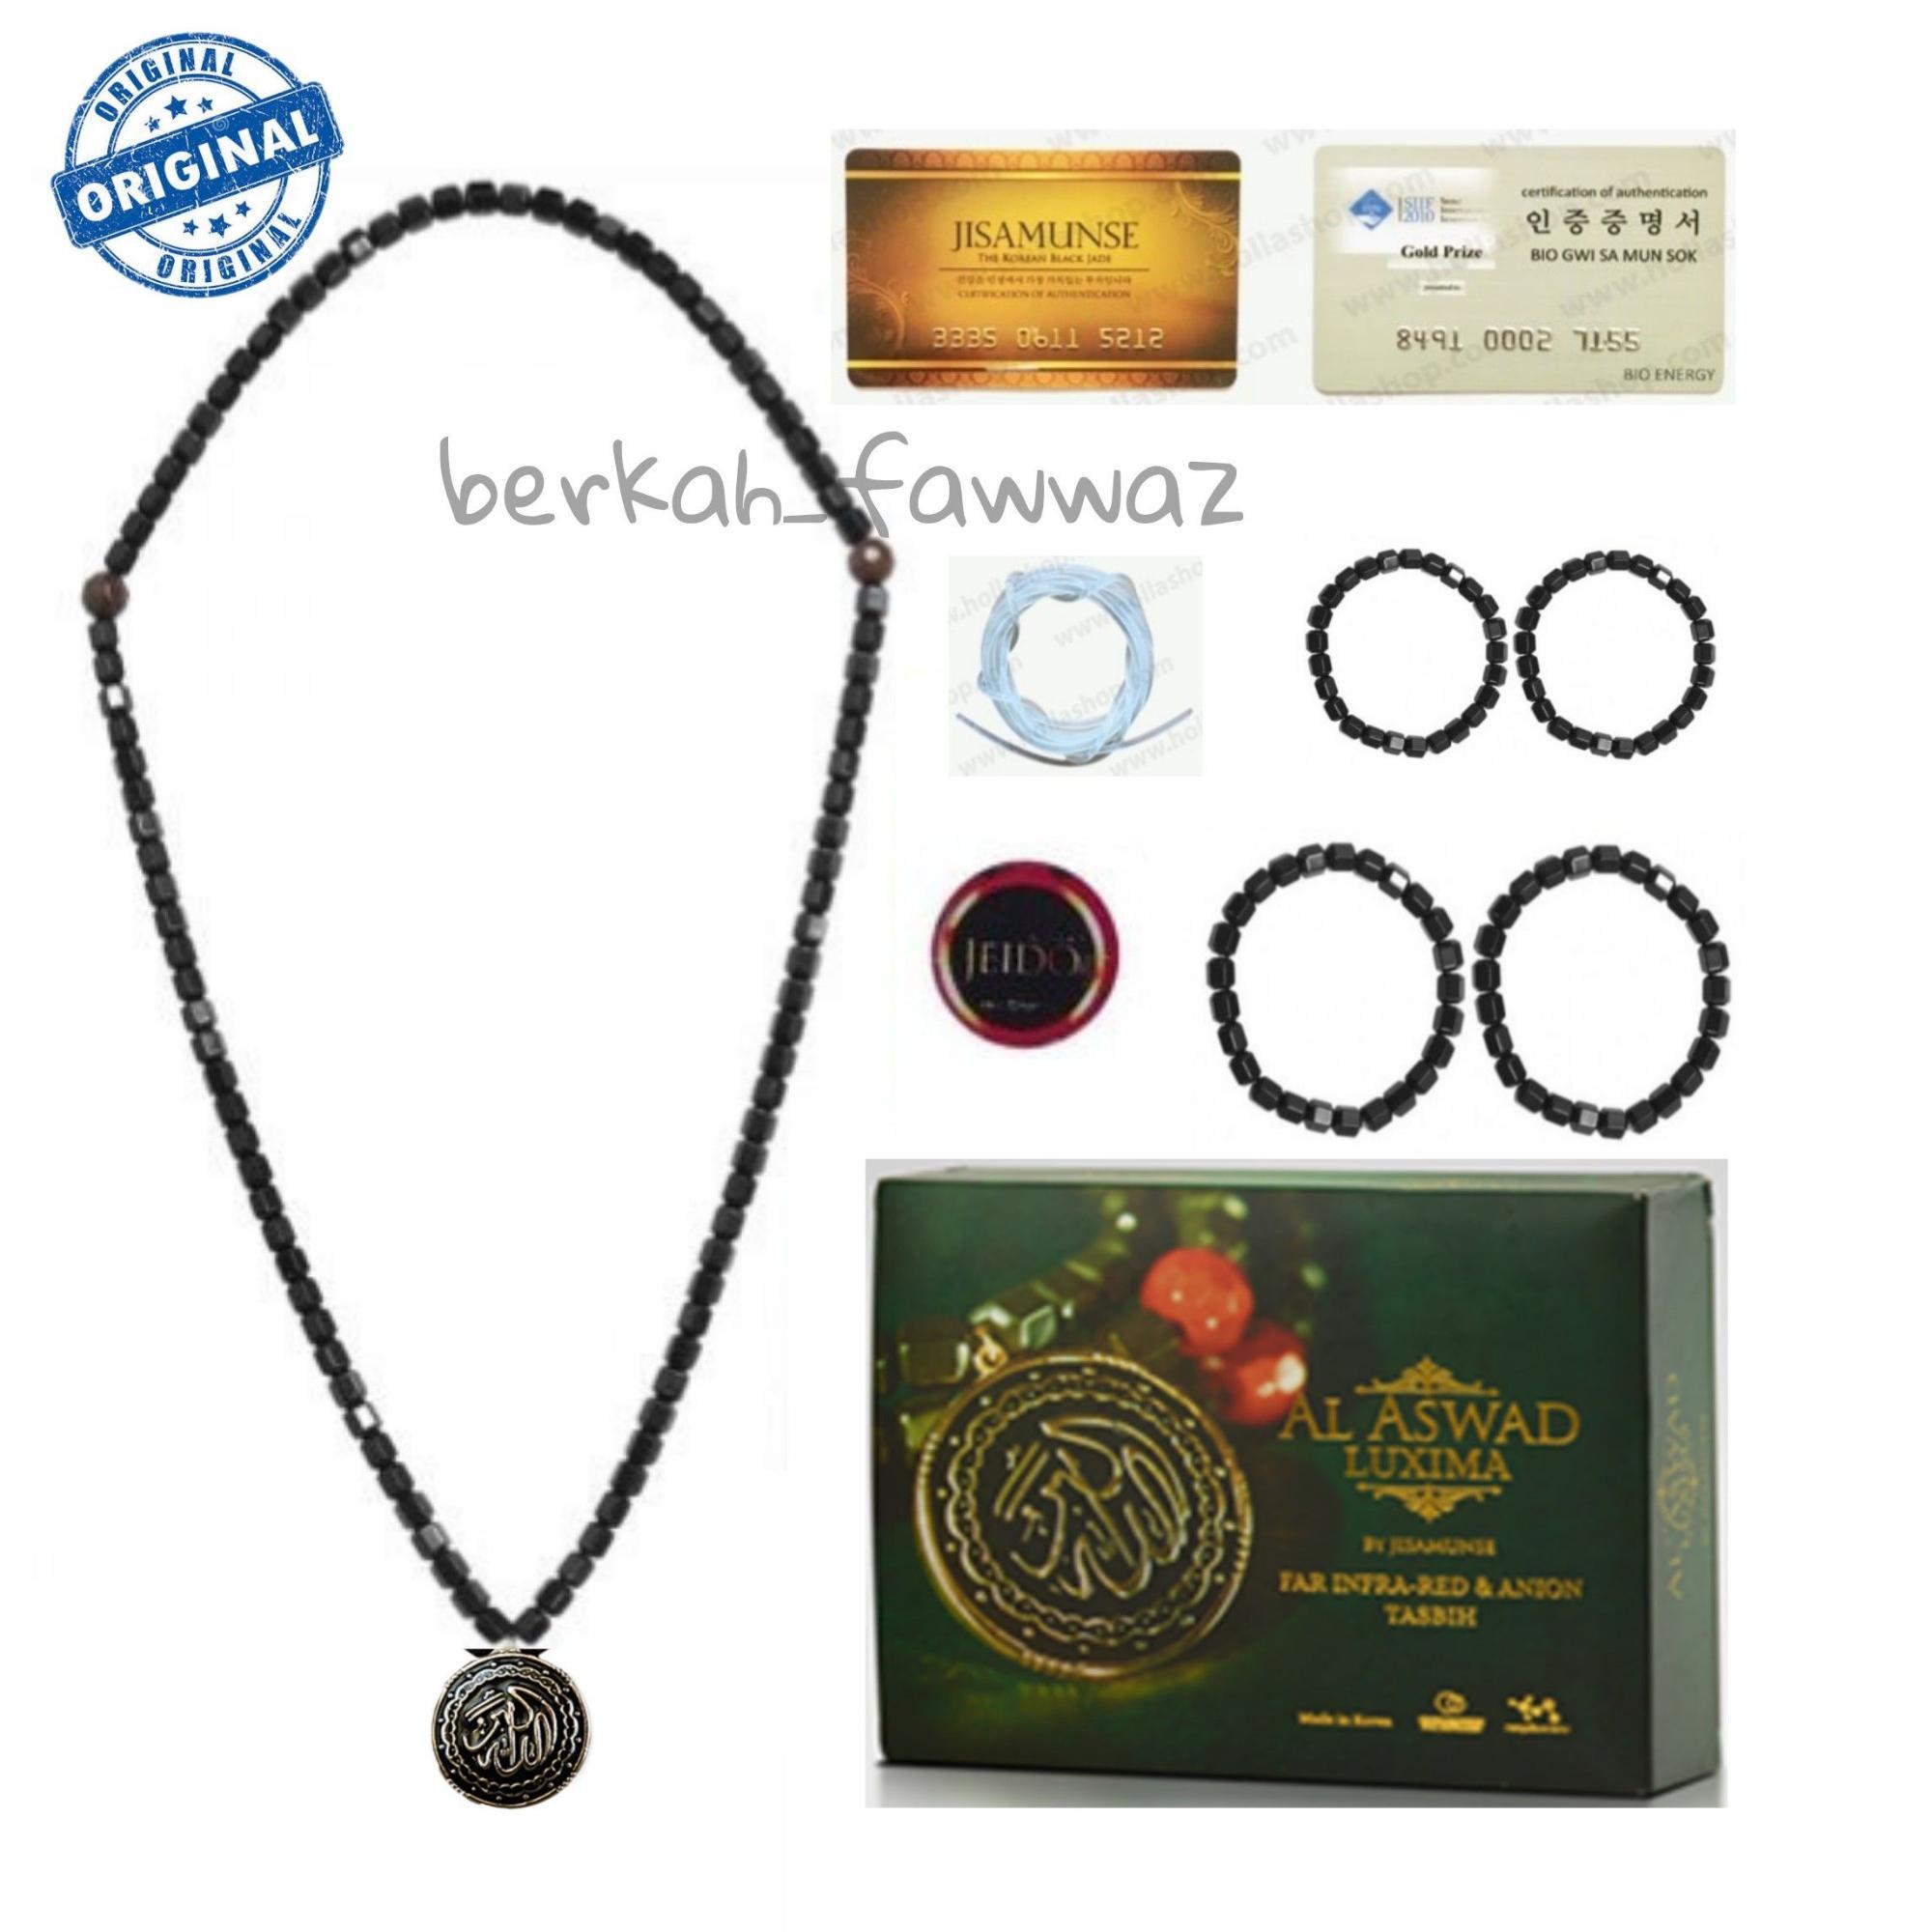 Harga Terkini Kalung Al Aswad Palsu Plus Diskon Website Black Jade Untuk Kesehatan Luxima Original Alaswad By Jisamunse